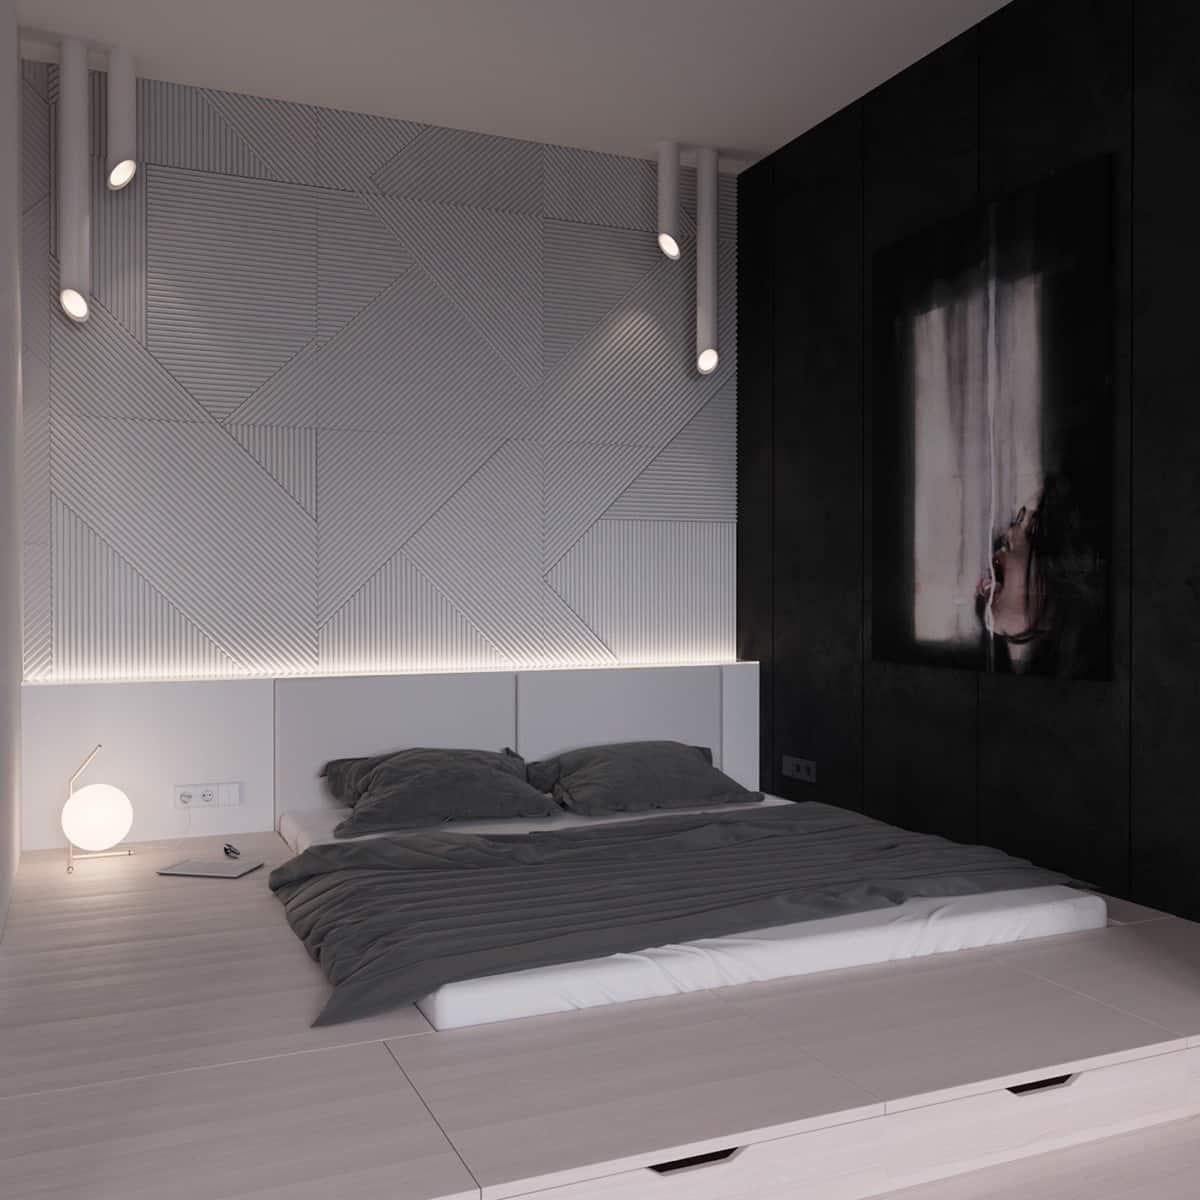 platform-bed-black-and-white-room-ideas